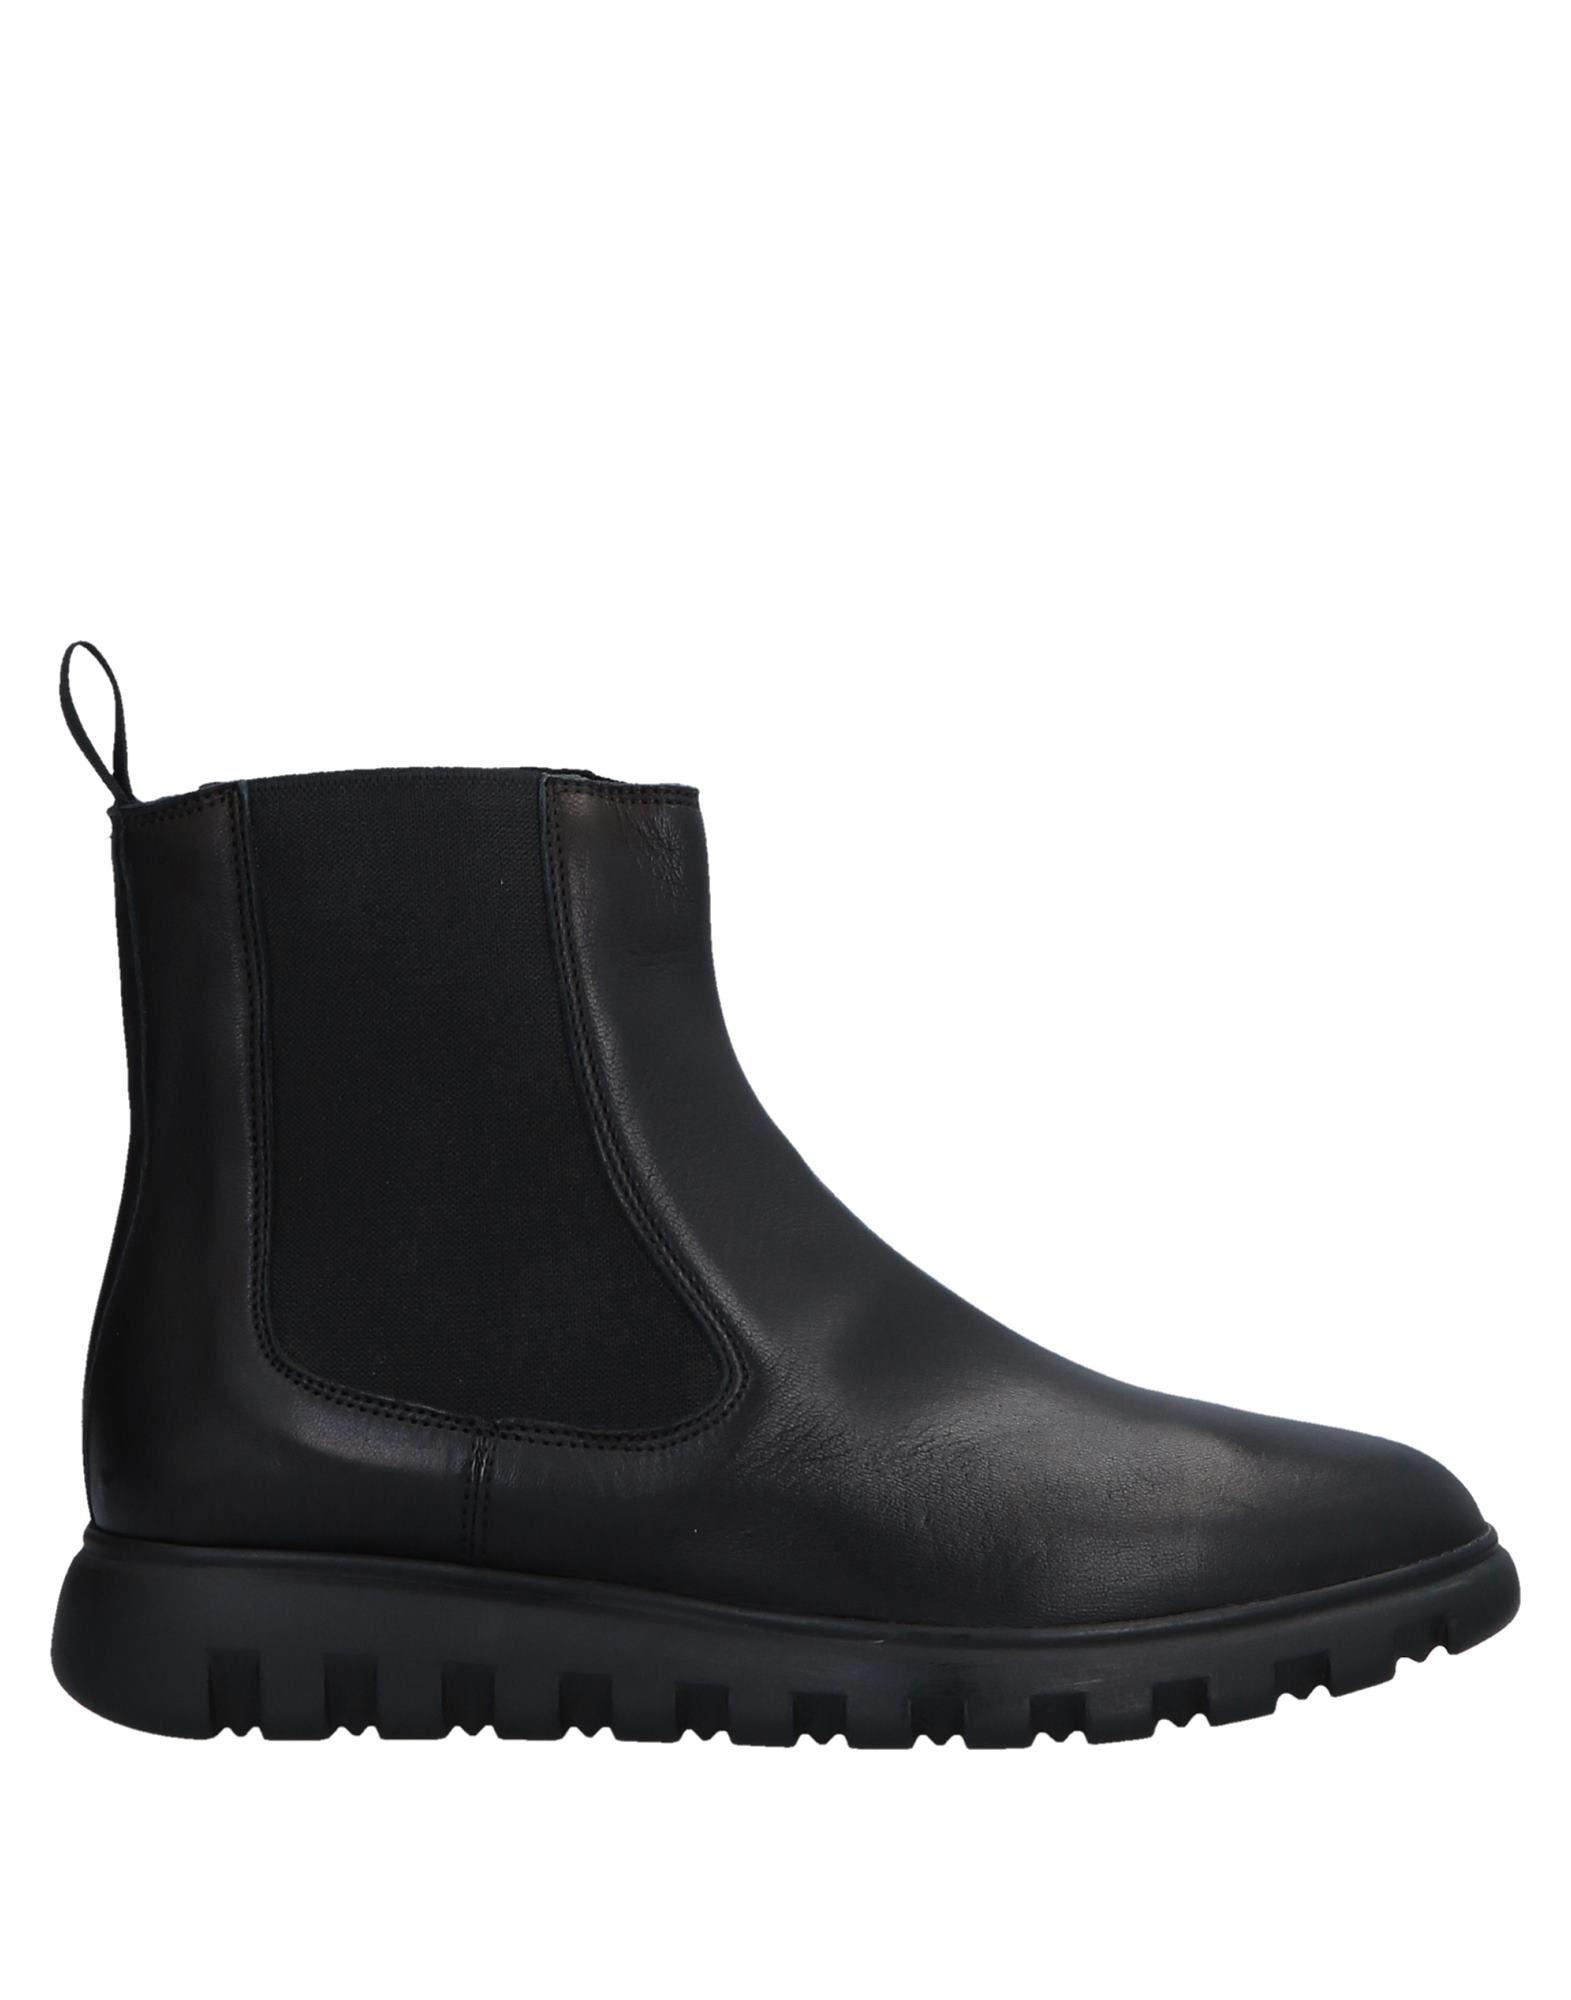 Chelsea Boots Blanche Voile Blanche Boots Donna - 11538310UI 9357d3